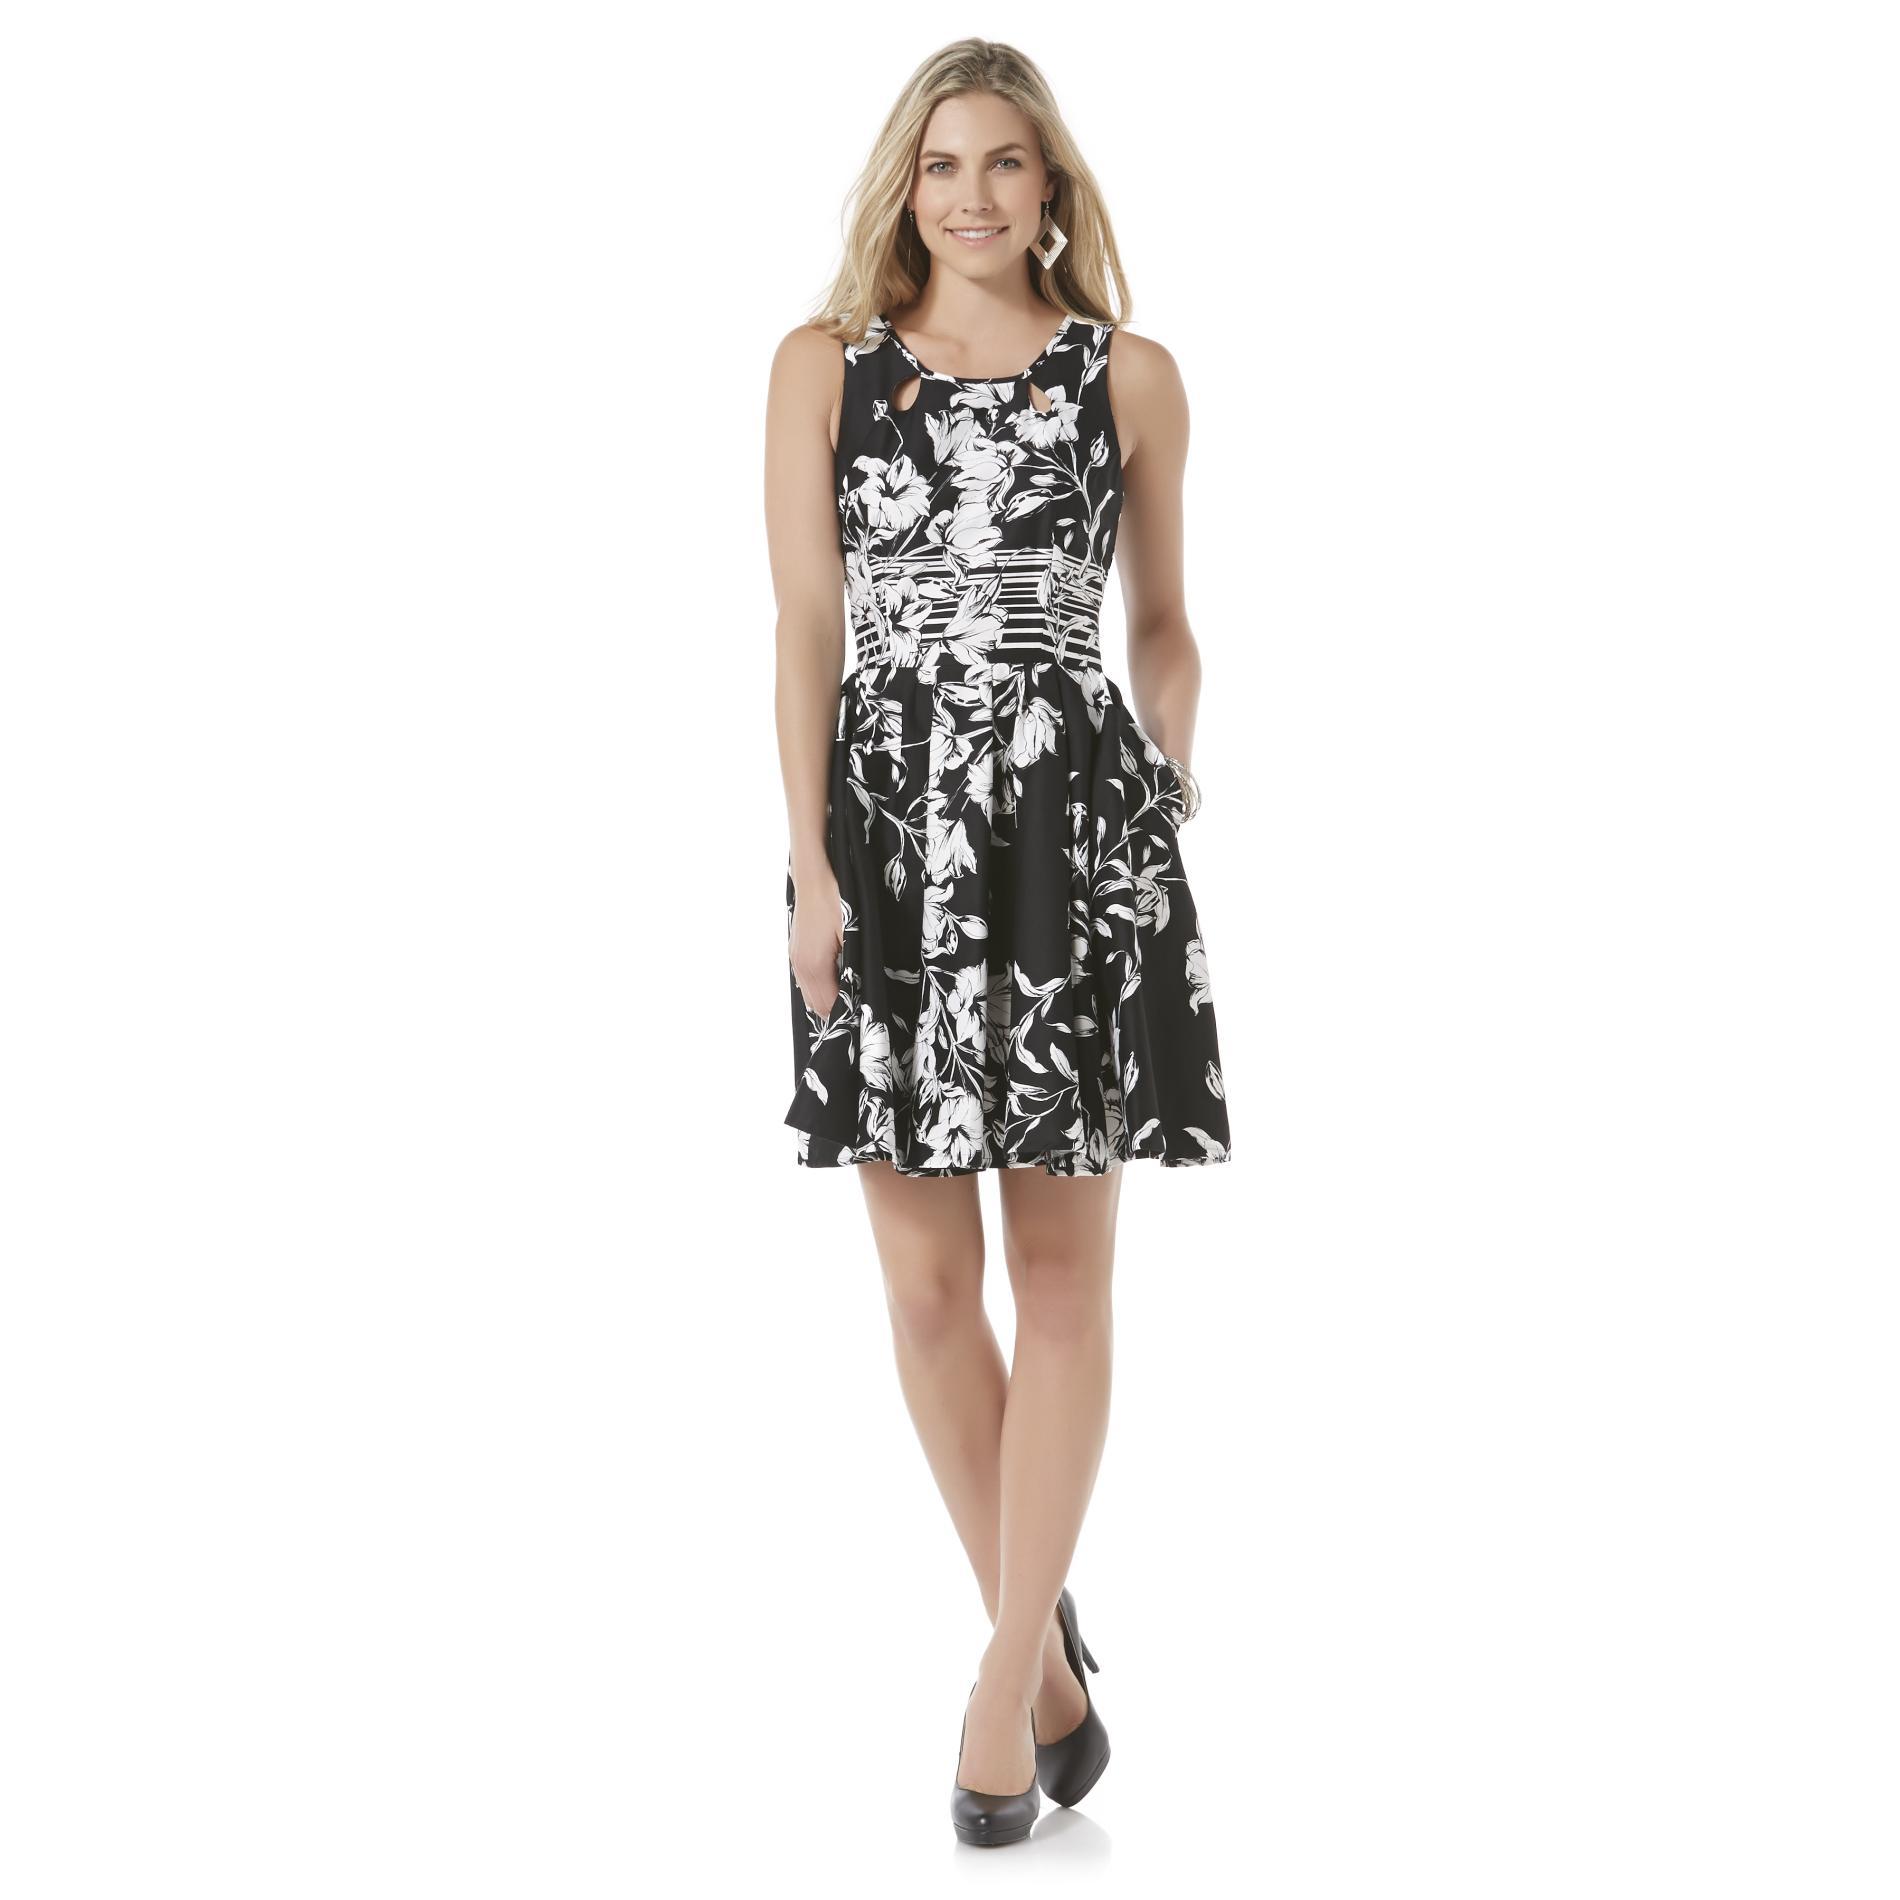 Gabby Skye Women's Pleated Sleeveless Party Dress - Floral